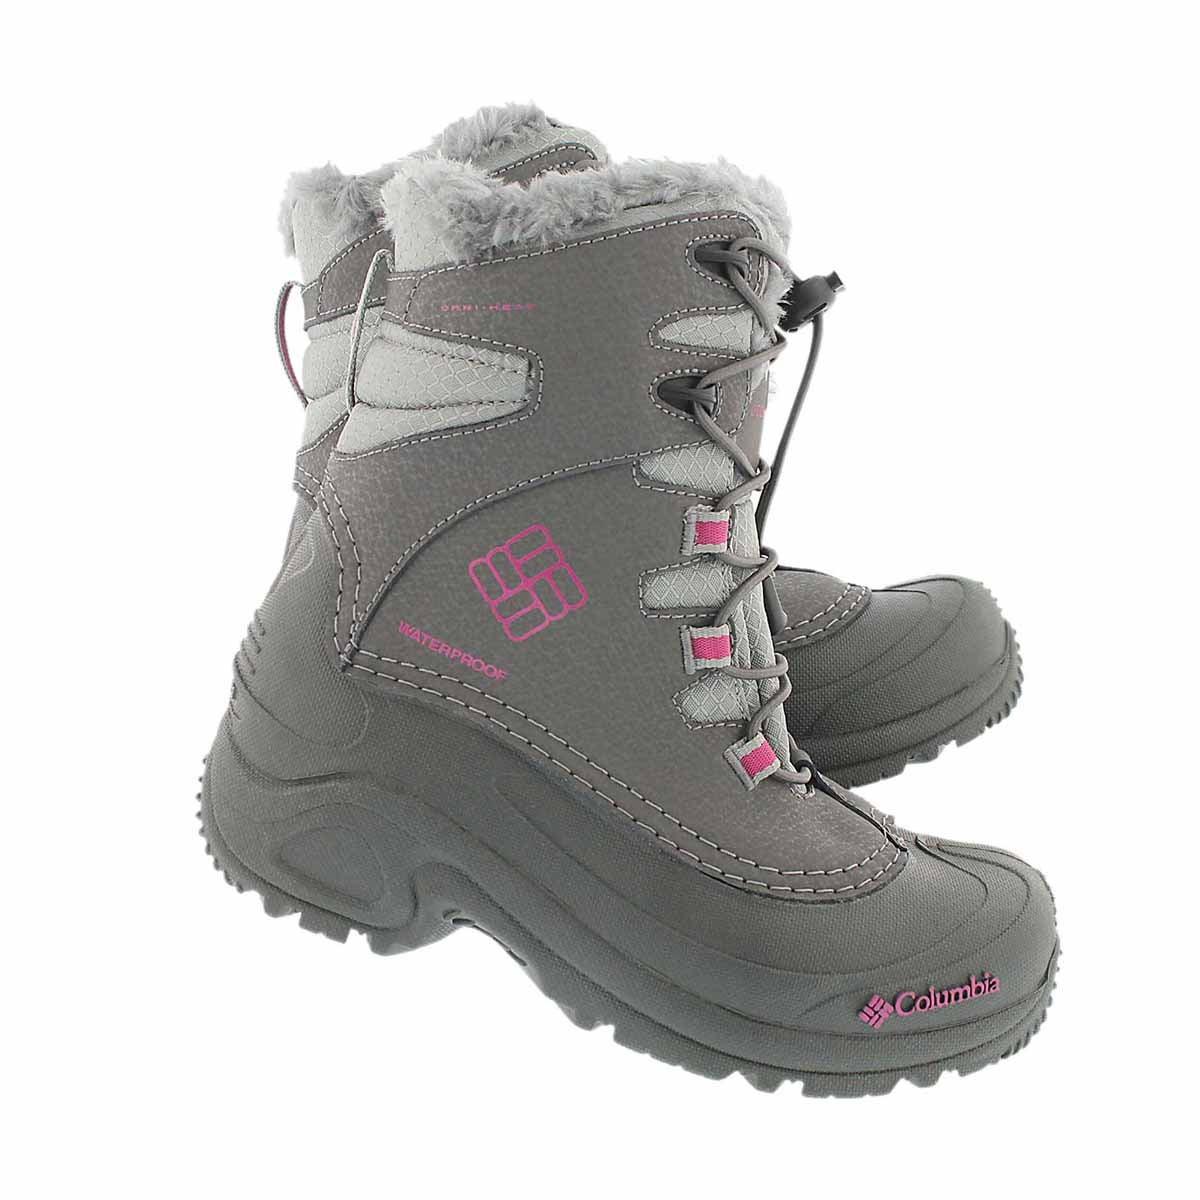 Grls Bugaboot shale winter boot